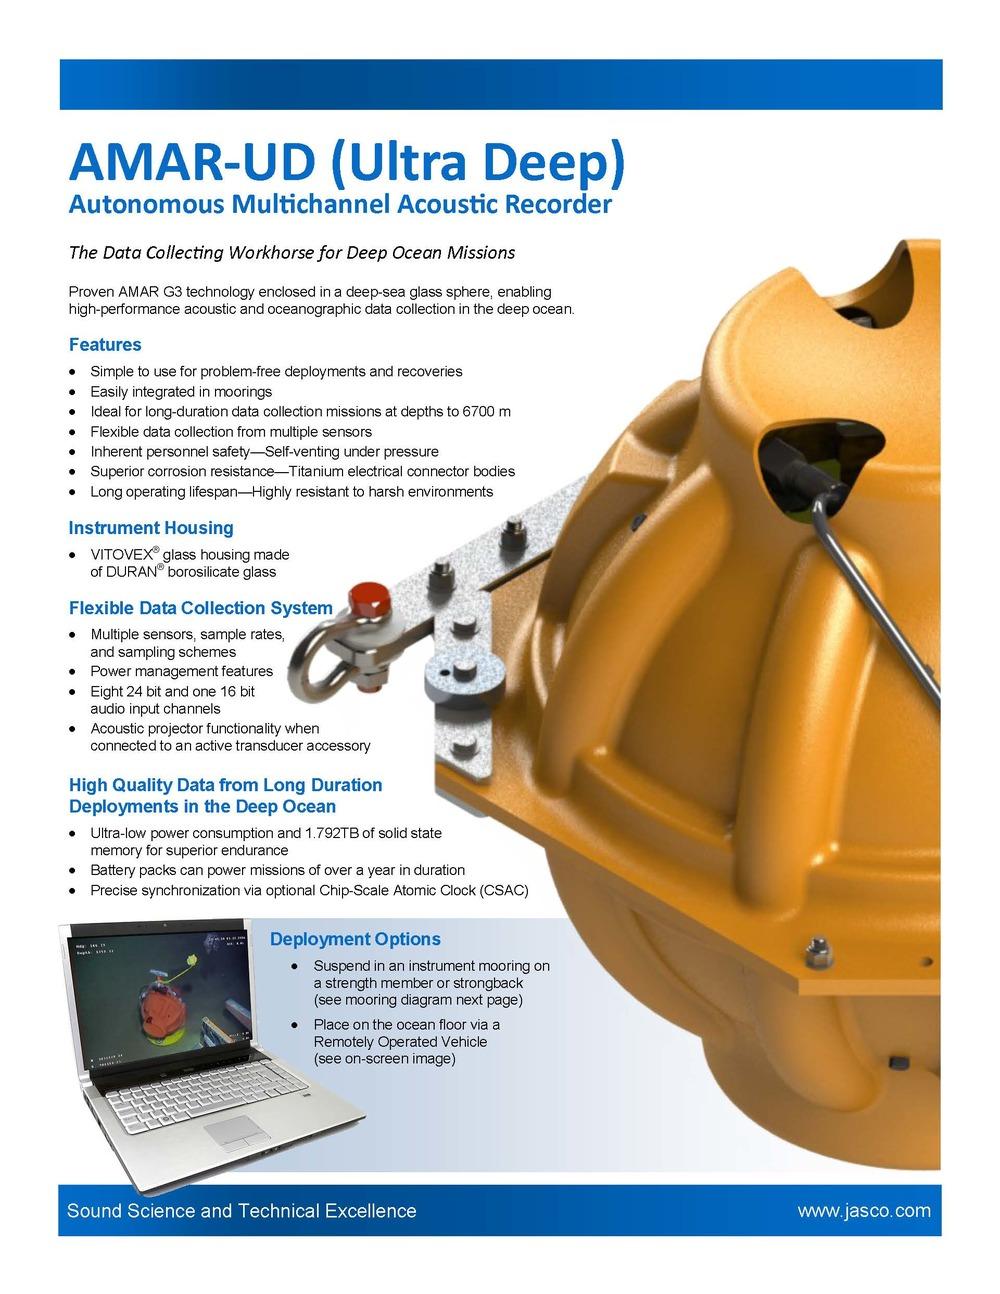 AMAR Ultra Deep (AMAR-UD) Letter size (PDF)  A4 size (PDF)